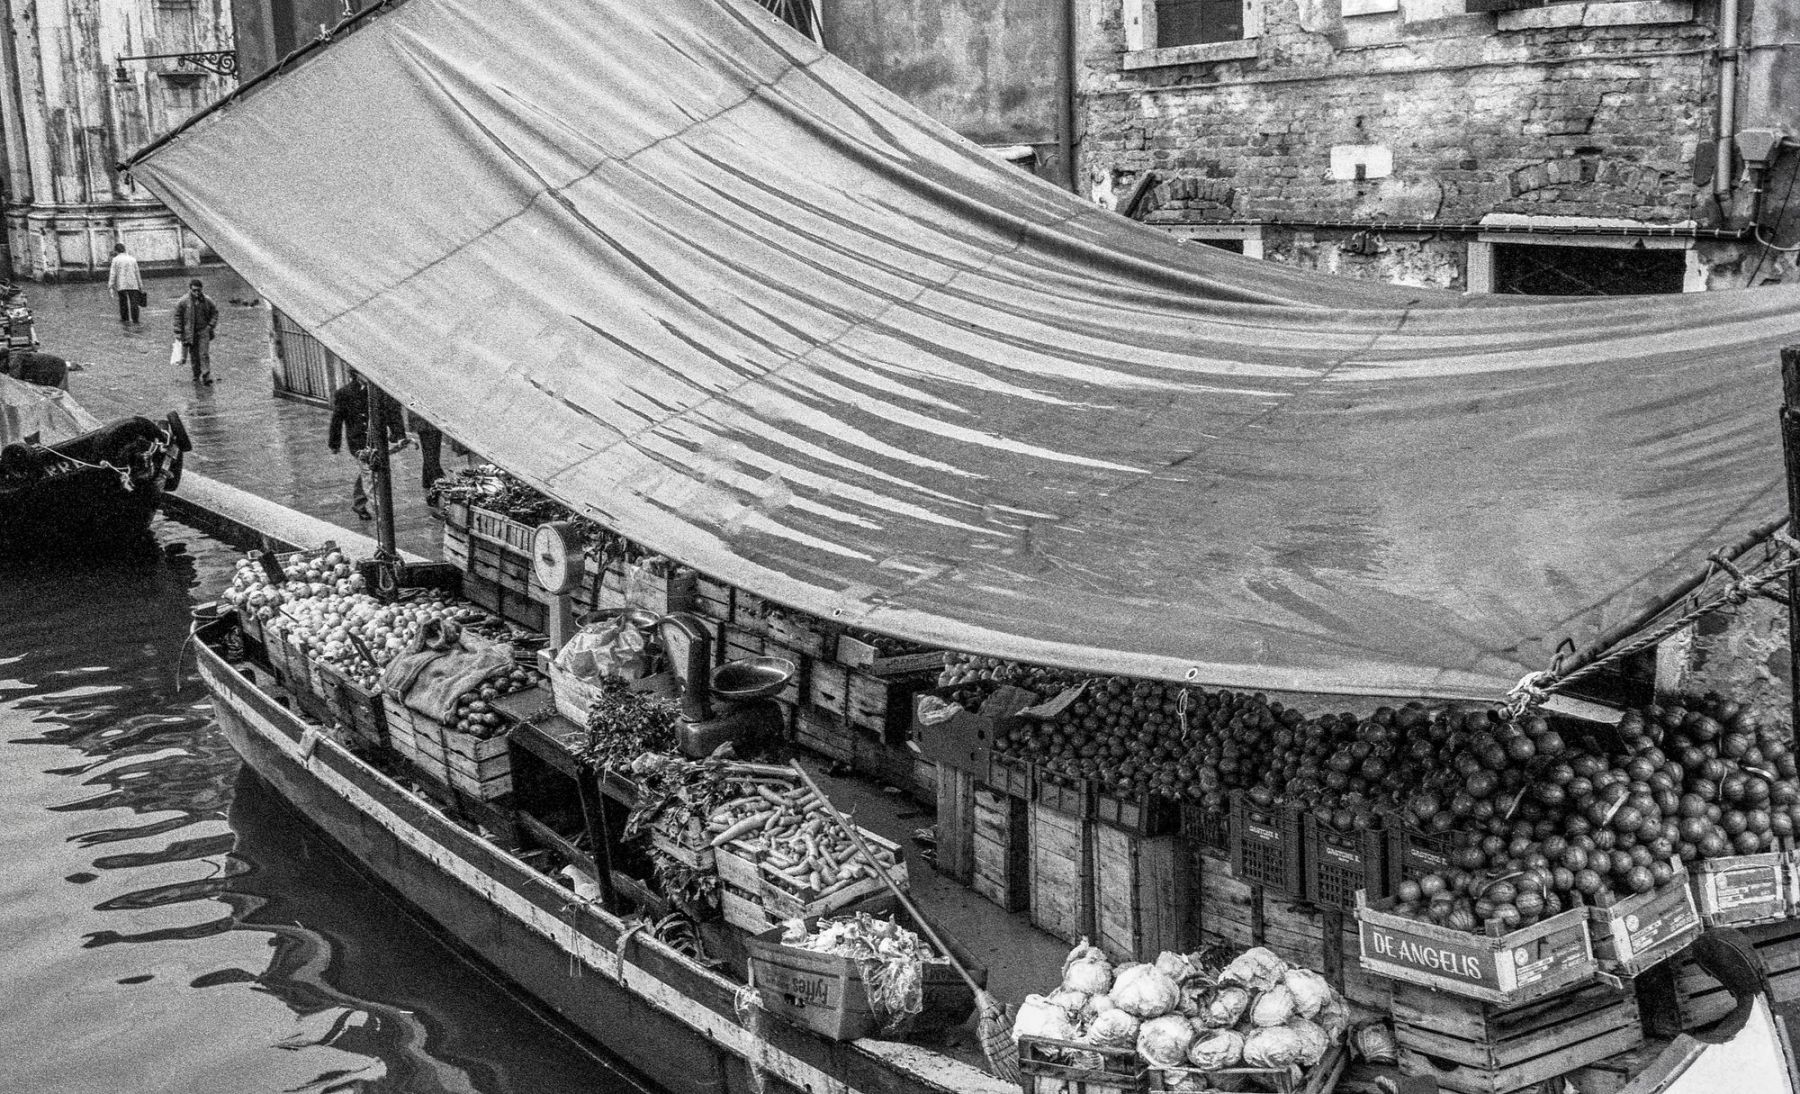 MichelAycaguer-Venise-AquaAlta-Noel-1981-21